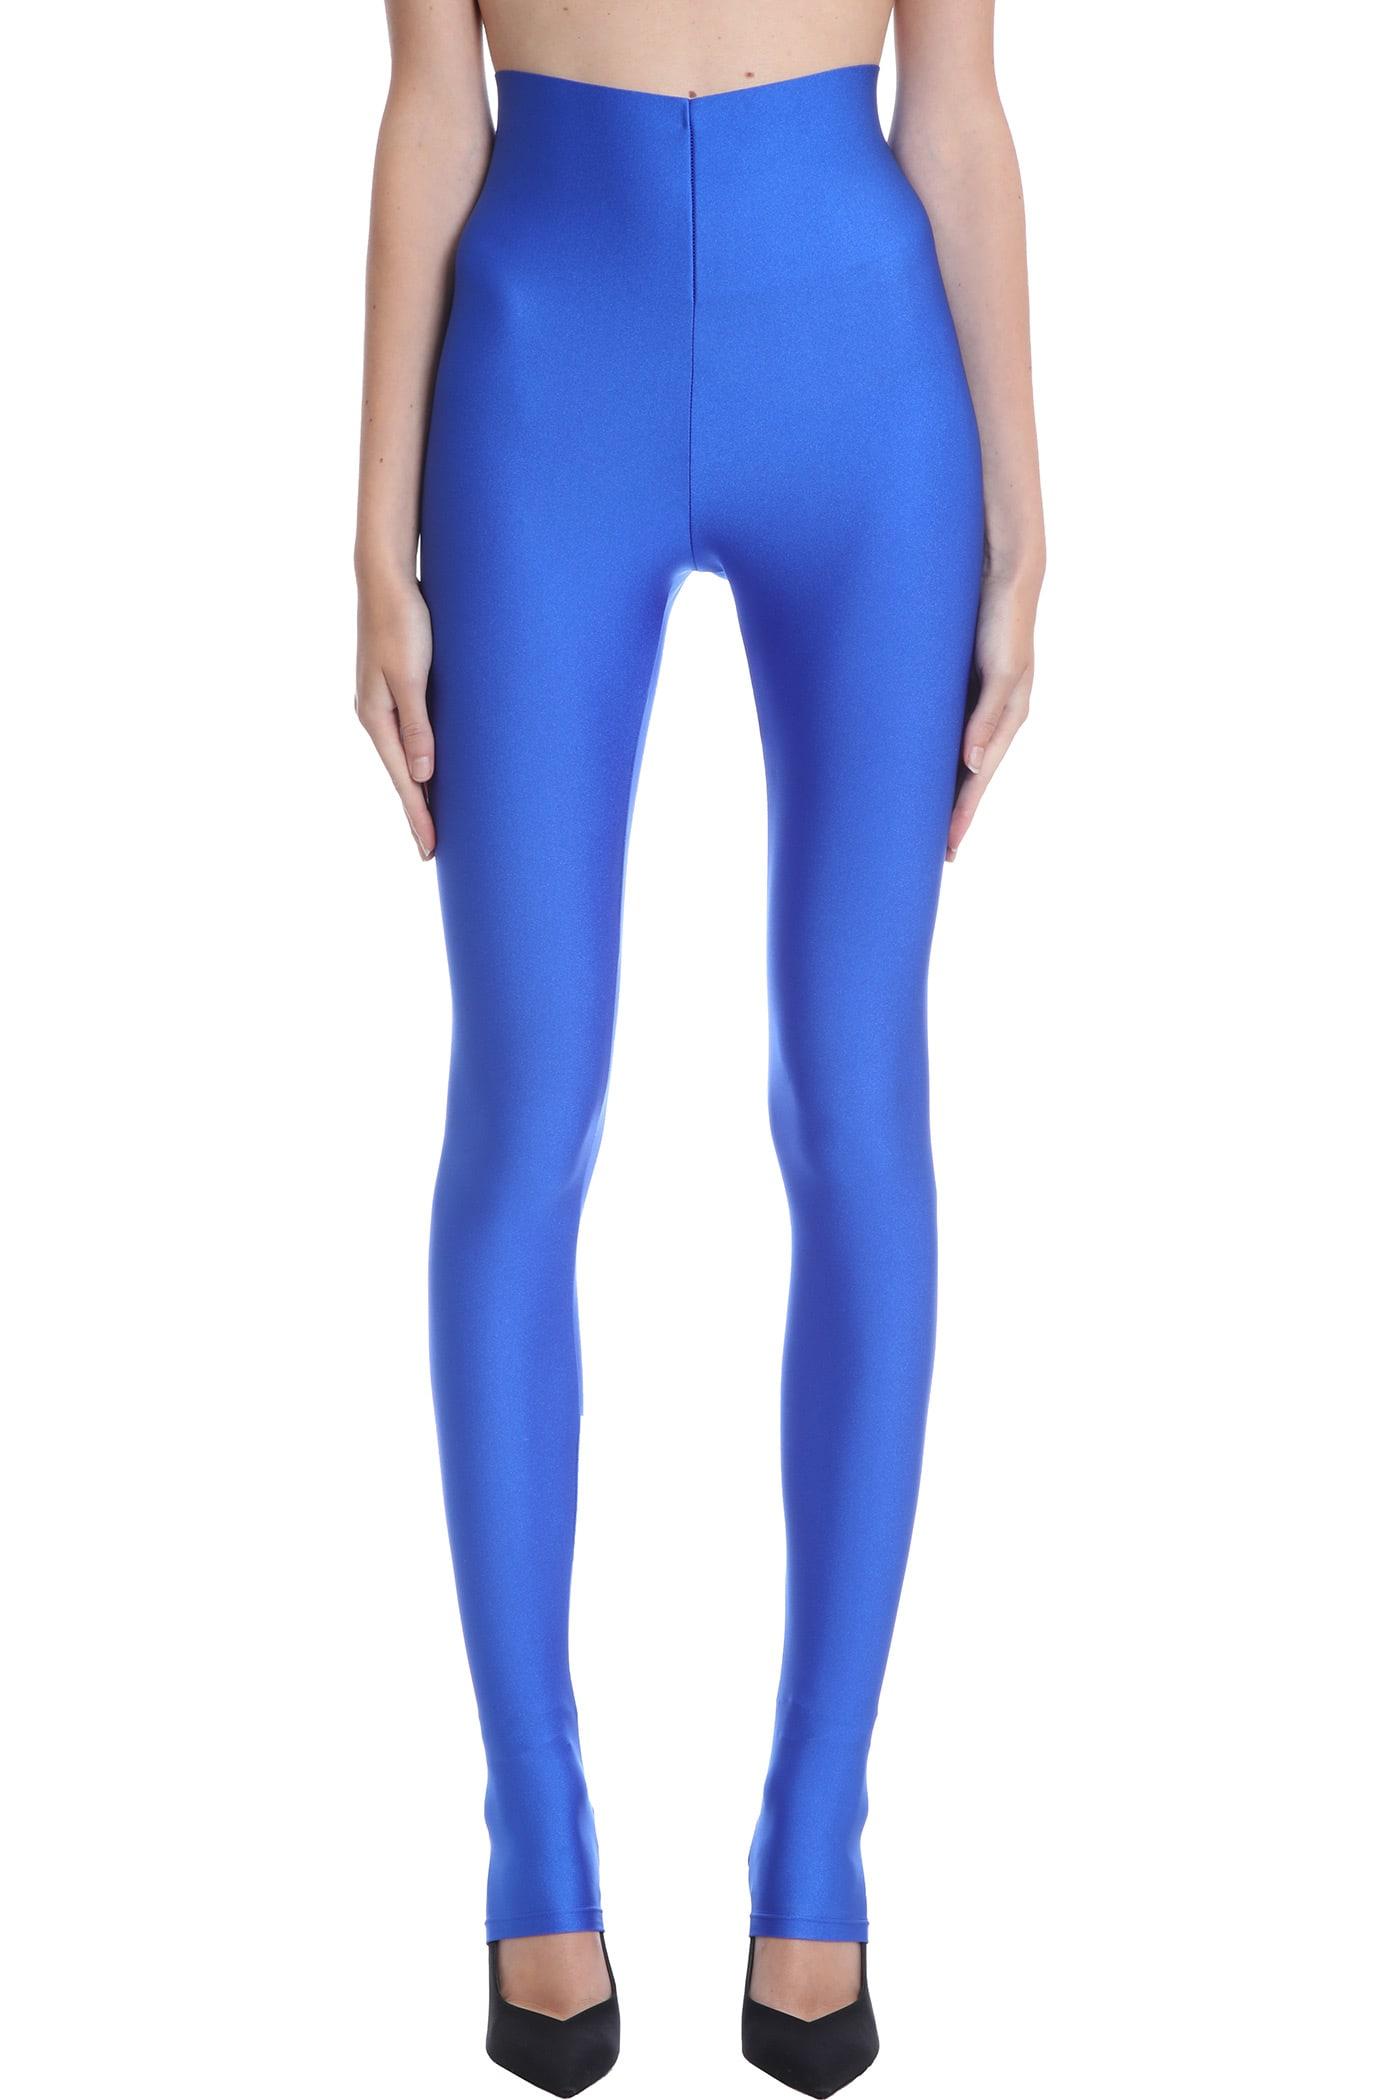 Holly Leggins In Blue Polyester